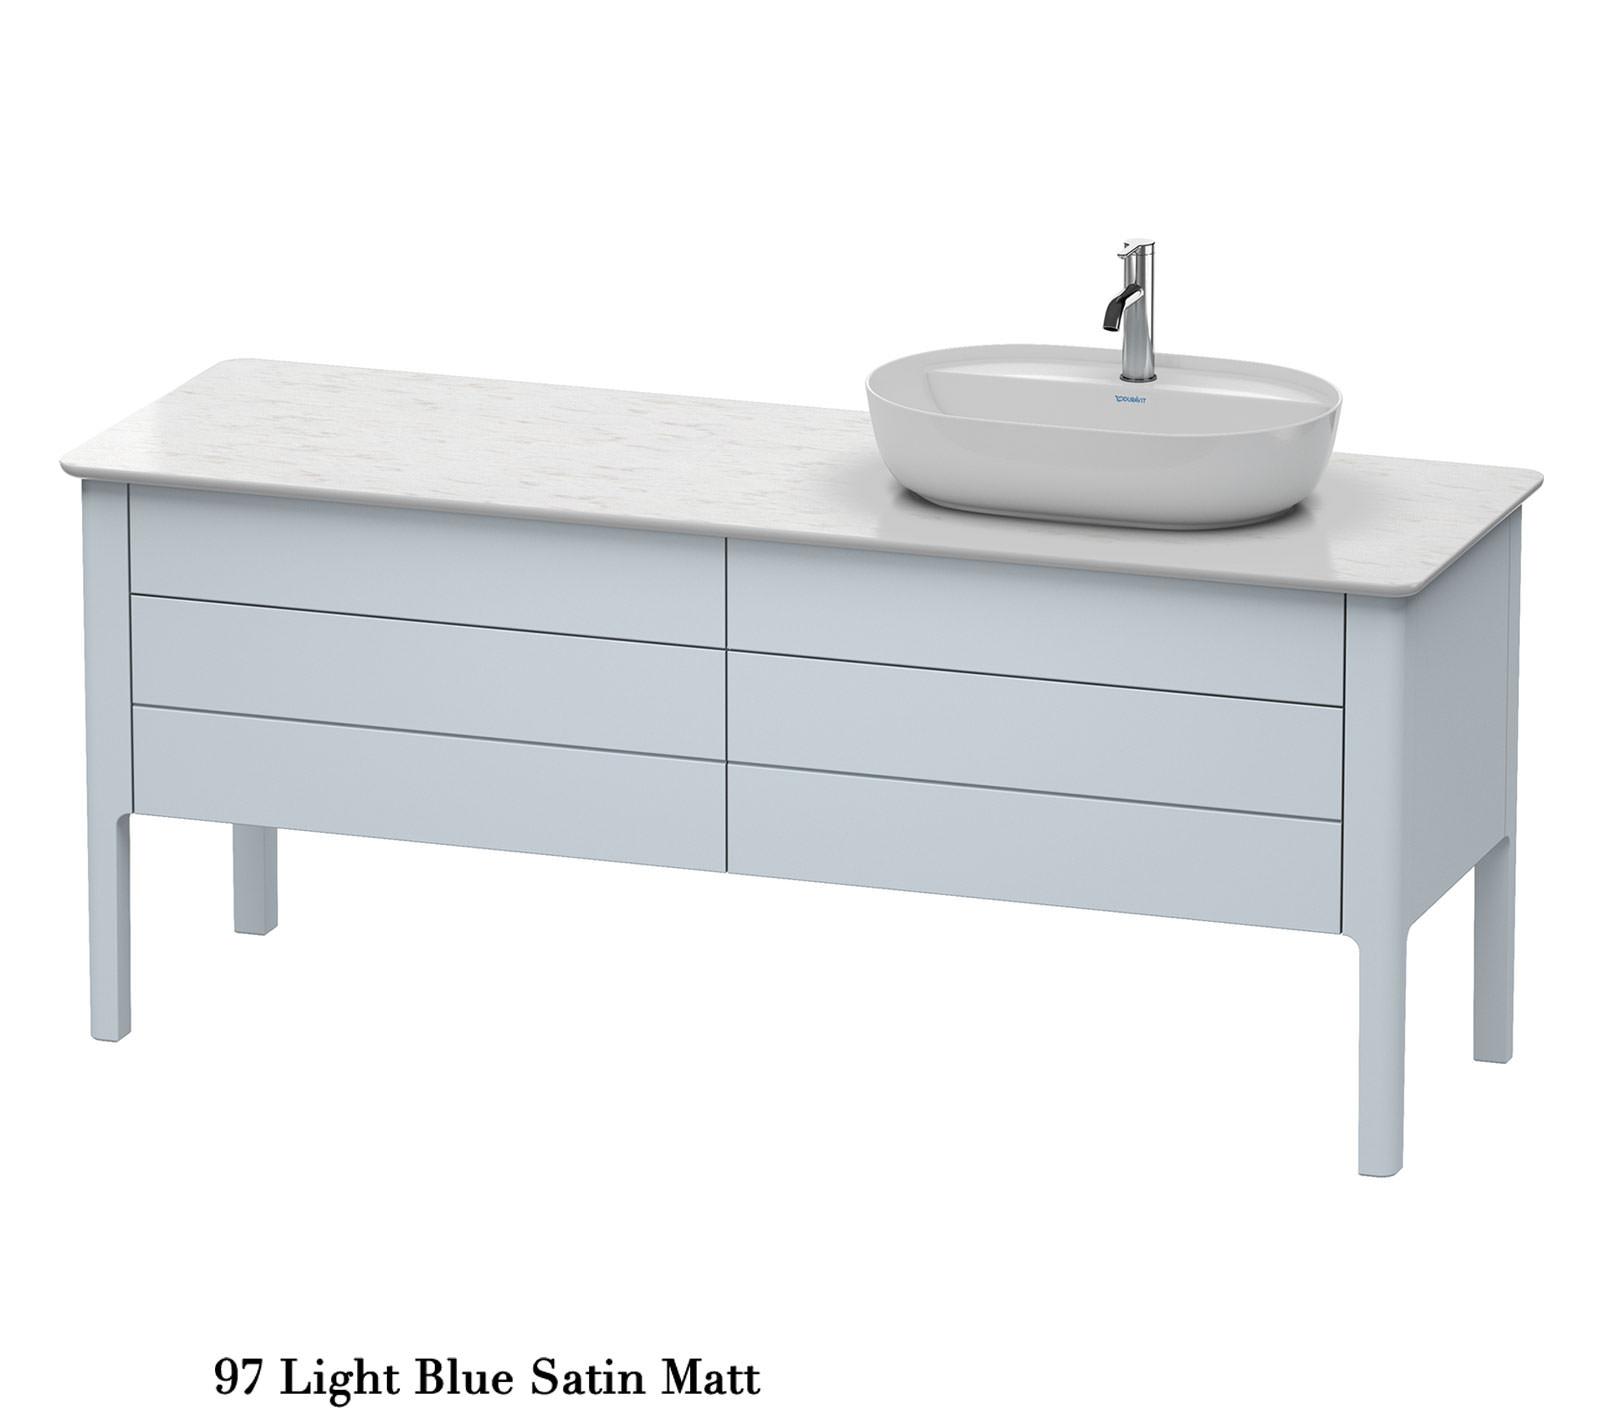 duravit luv 1783x570mm 2 drawer unit night blue satin. Black Bedroom Furniture Sets. Home Design Ideas